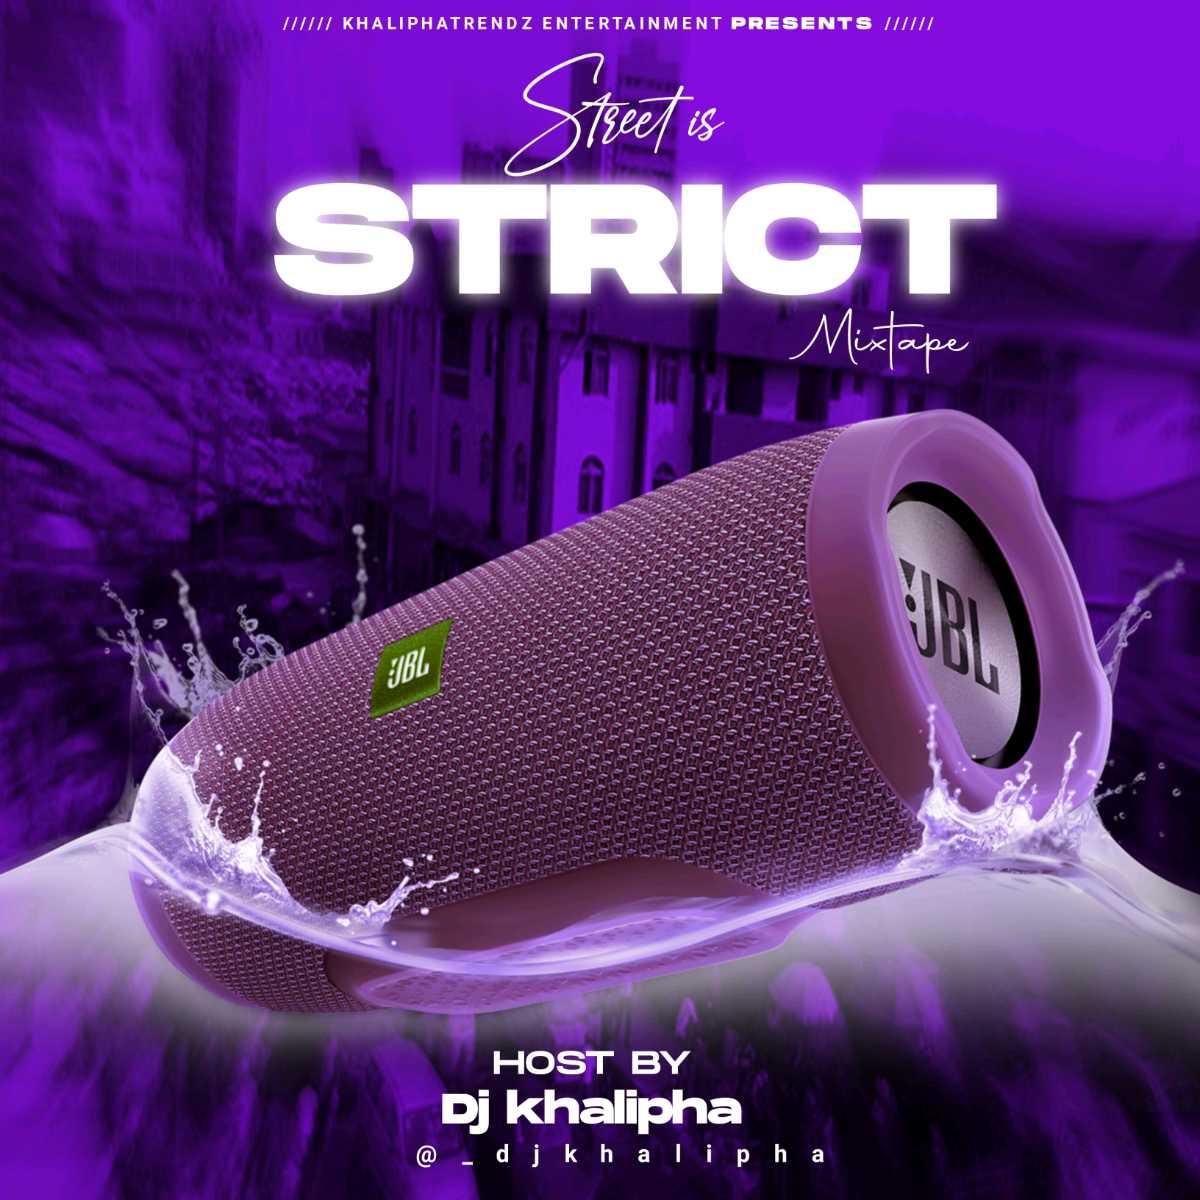 Dj Khalipha - Street Is Strict Mix